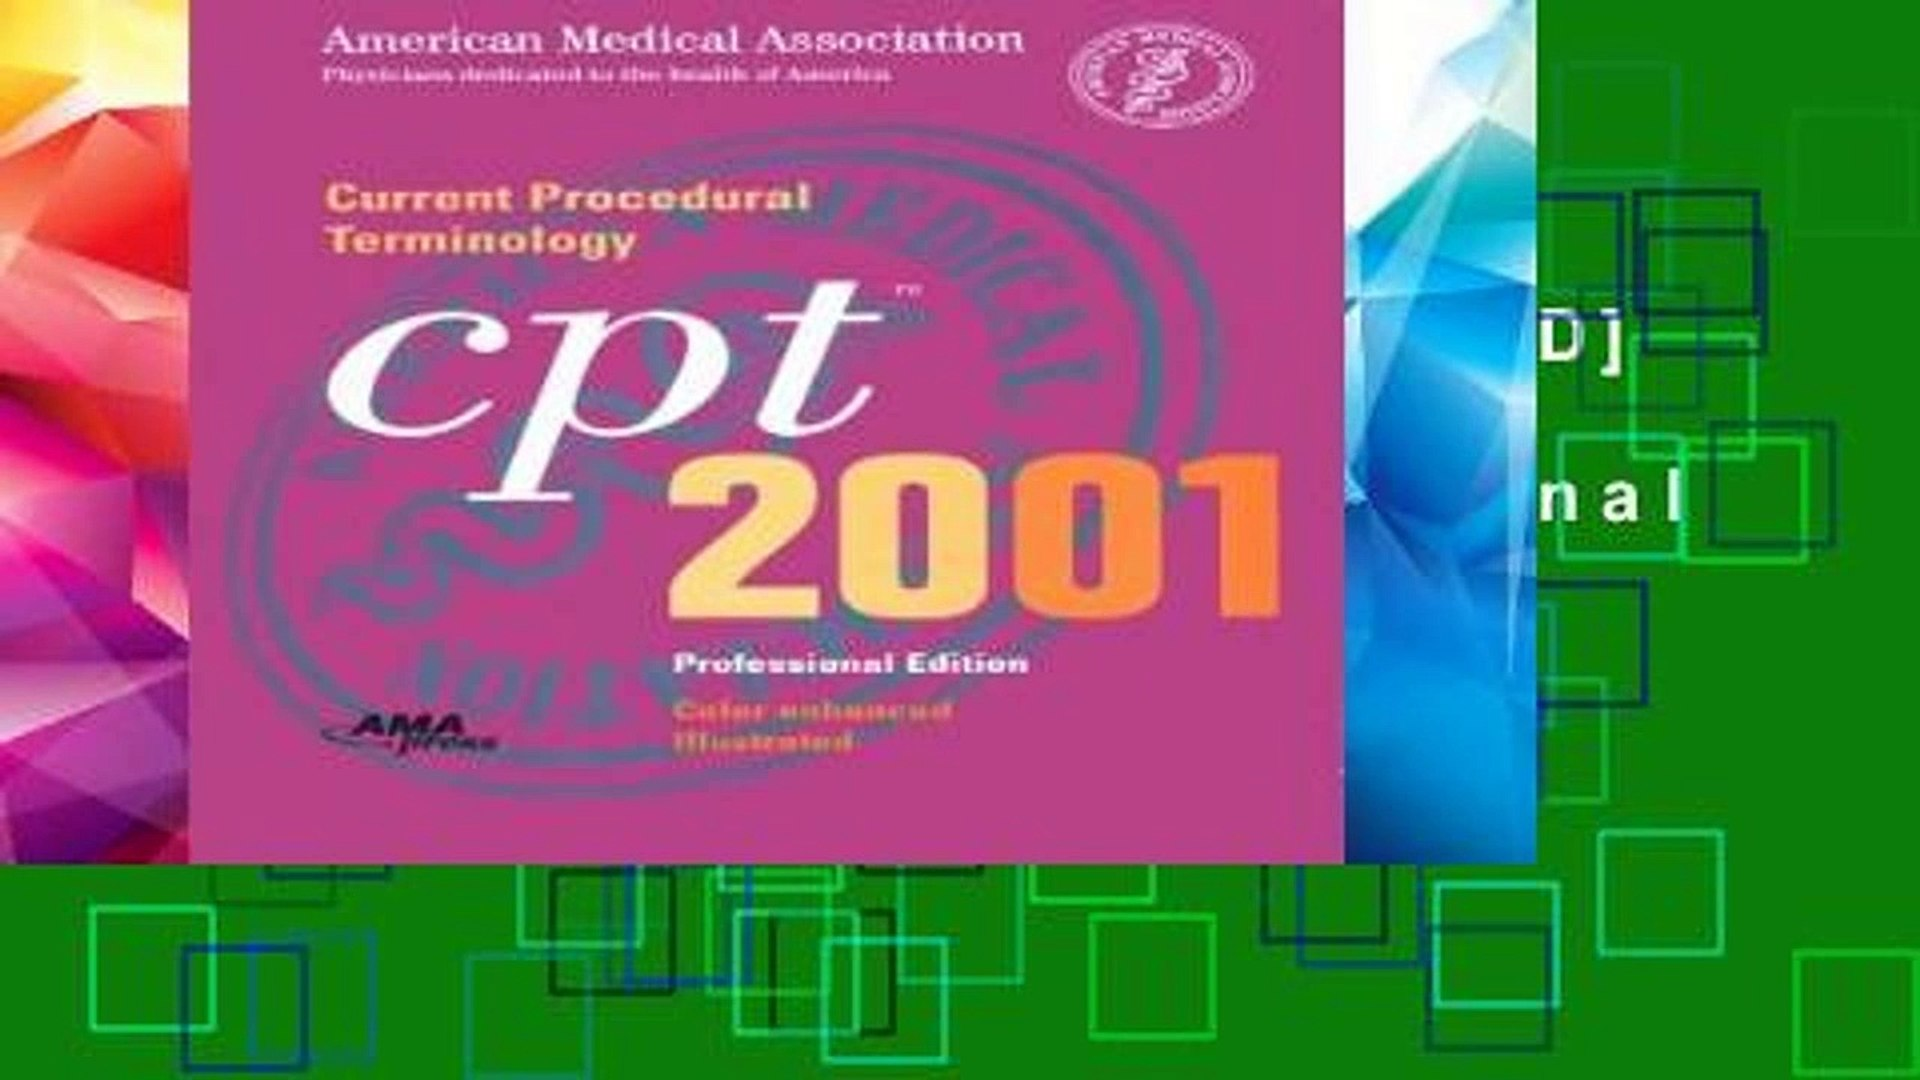 F.R.E.E [D.O.W.N.L.O.A.D] 2001 Cpt: Professional Edition (Cpt: Professional Edition, 2001)